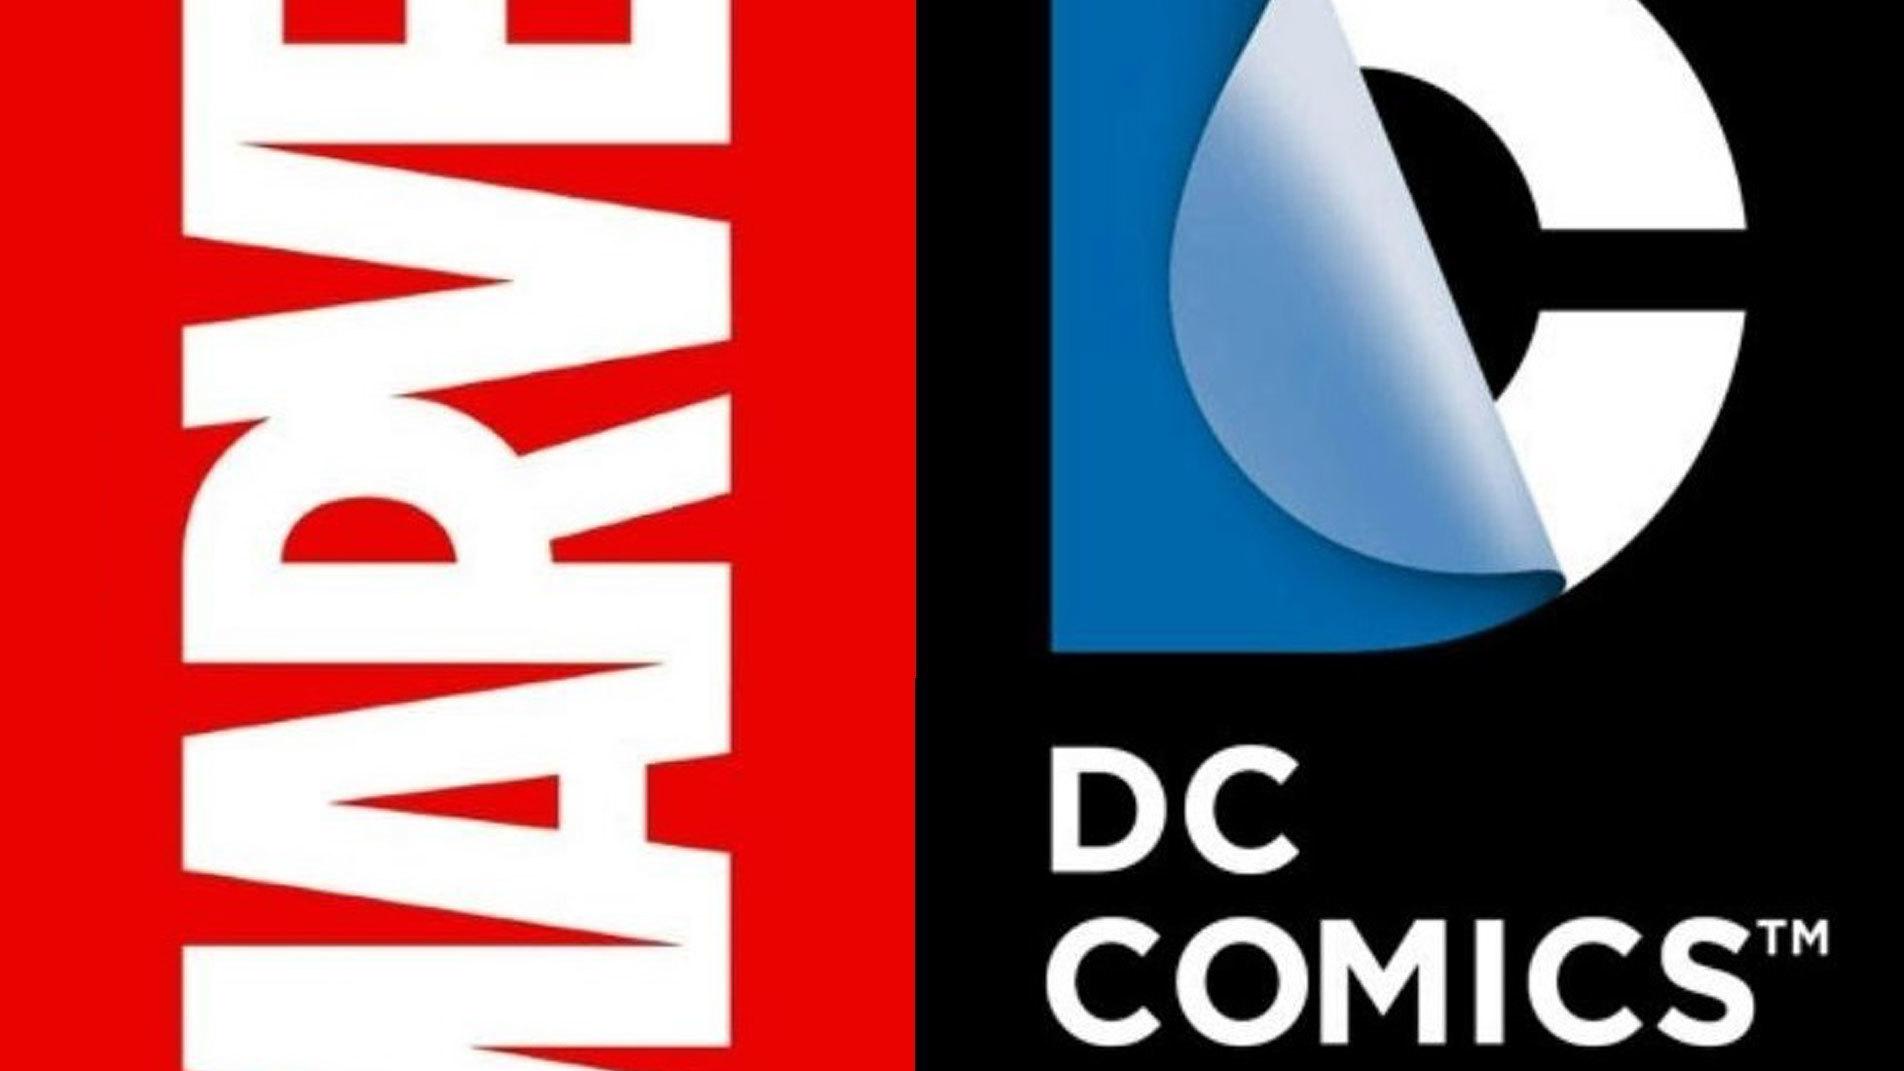 POLL: Marvel Cinematic Universe vs. DC Cinematic Universe